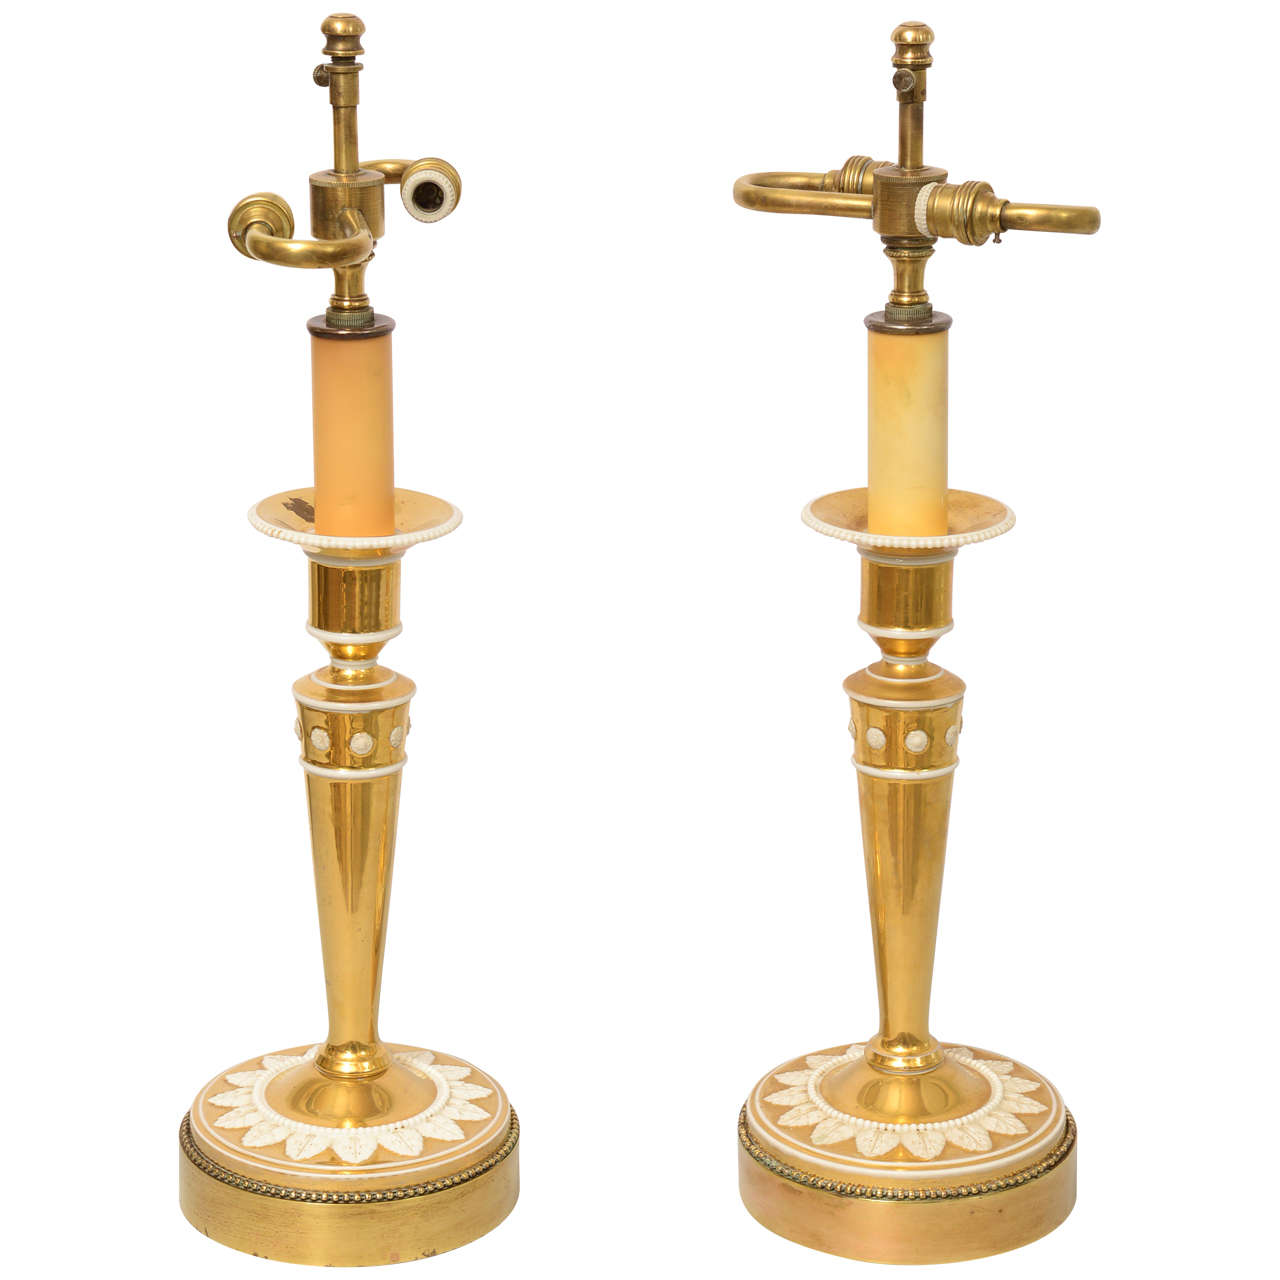 Fine Pair of Gilt Porcelain Candlestick Lamps